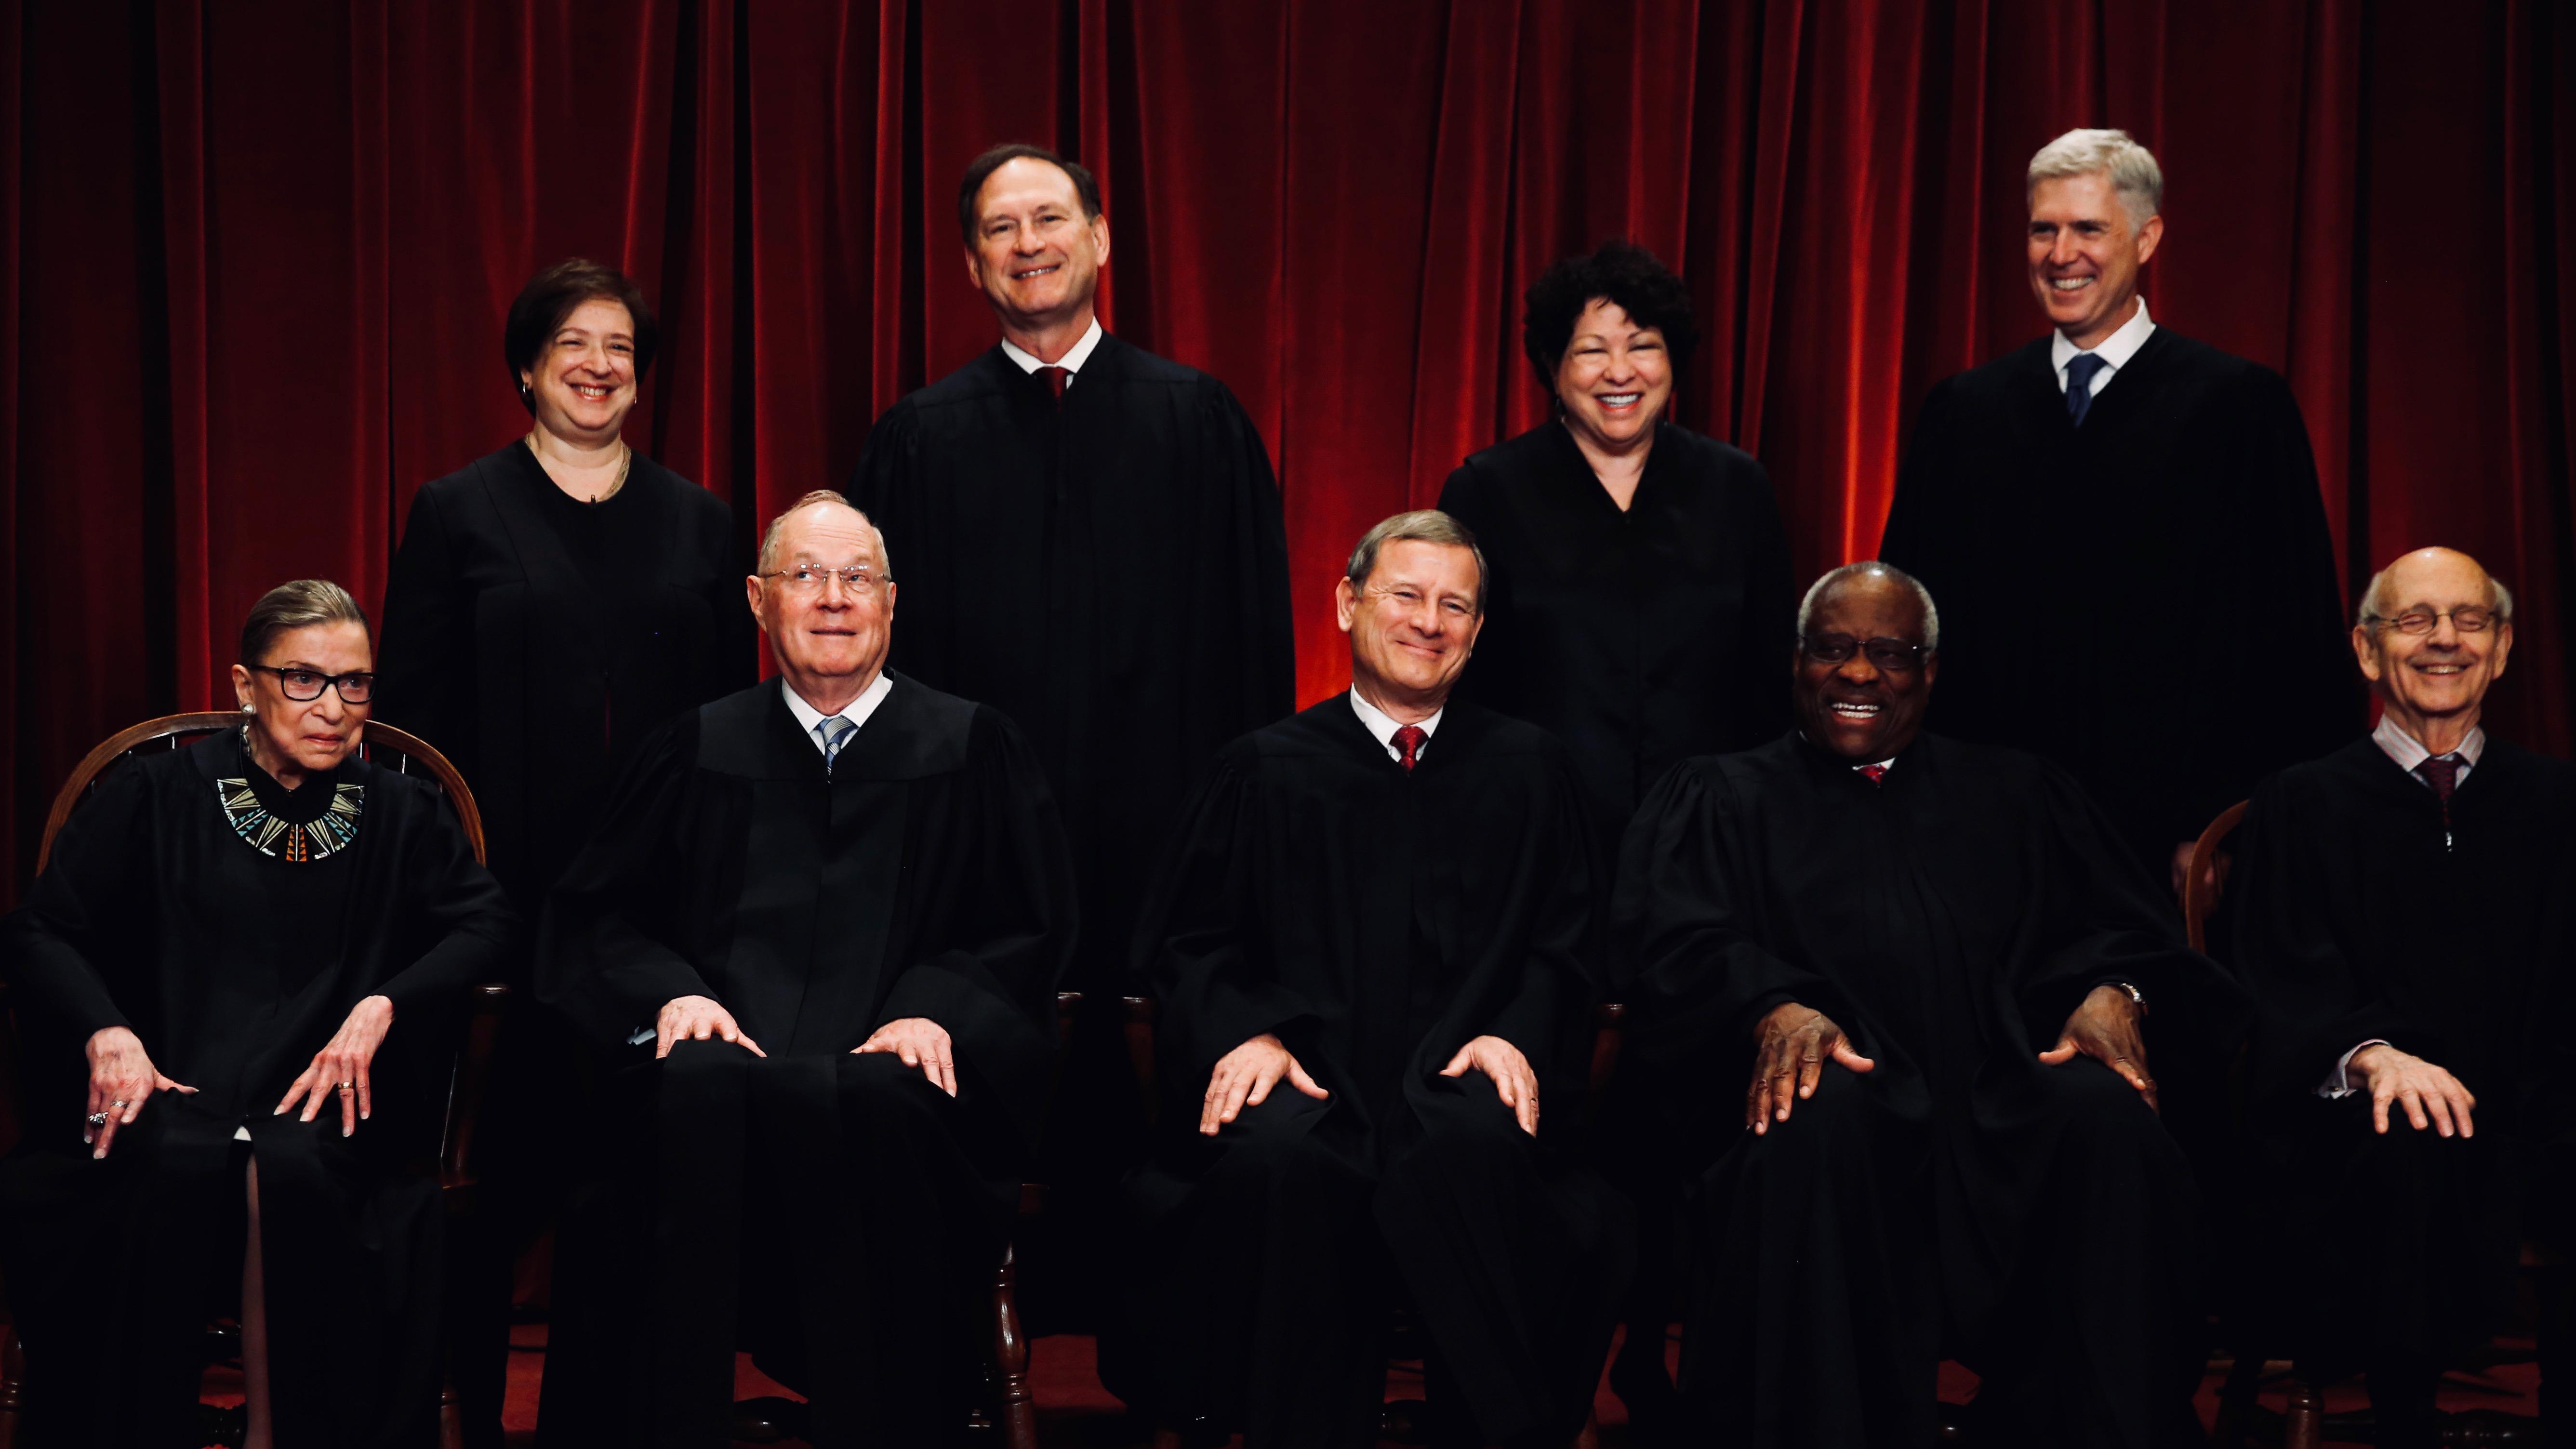 US Supreme Court family photo.